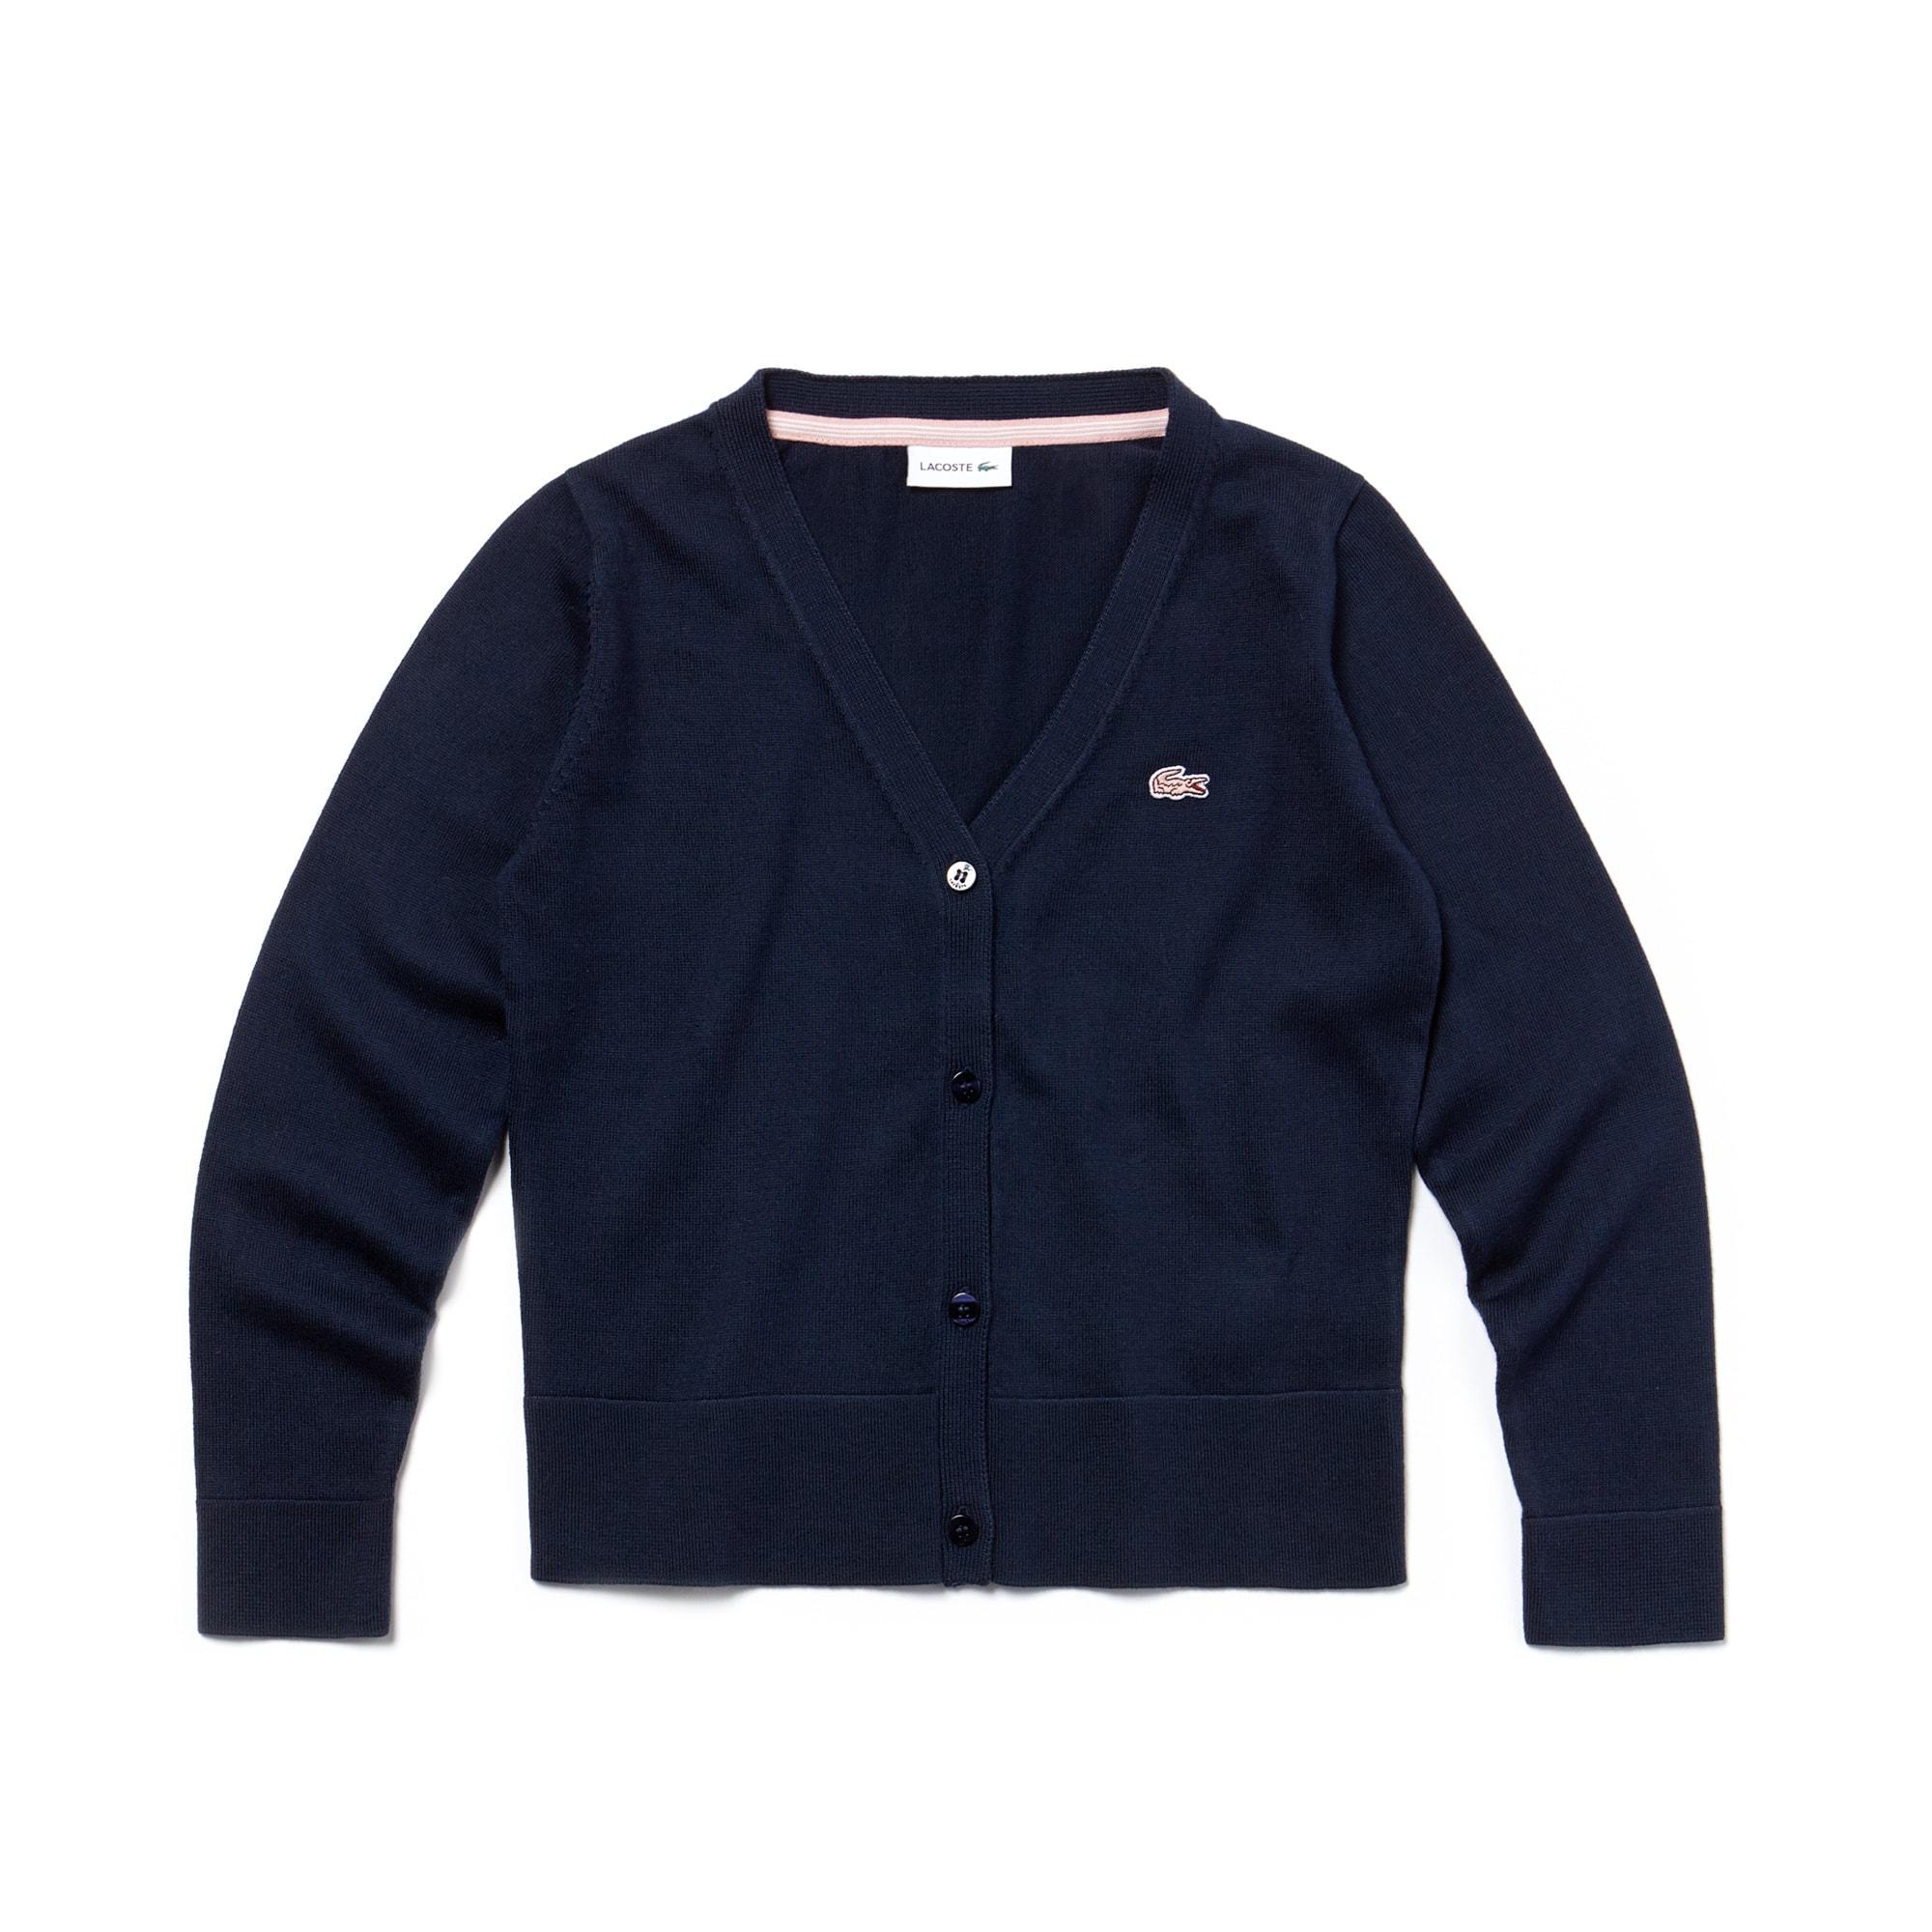 Cárdigan de niña de punto jersey de algodón liso